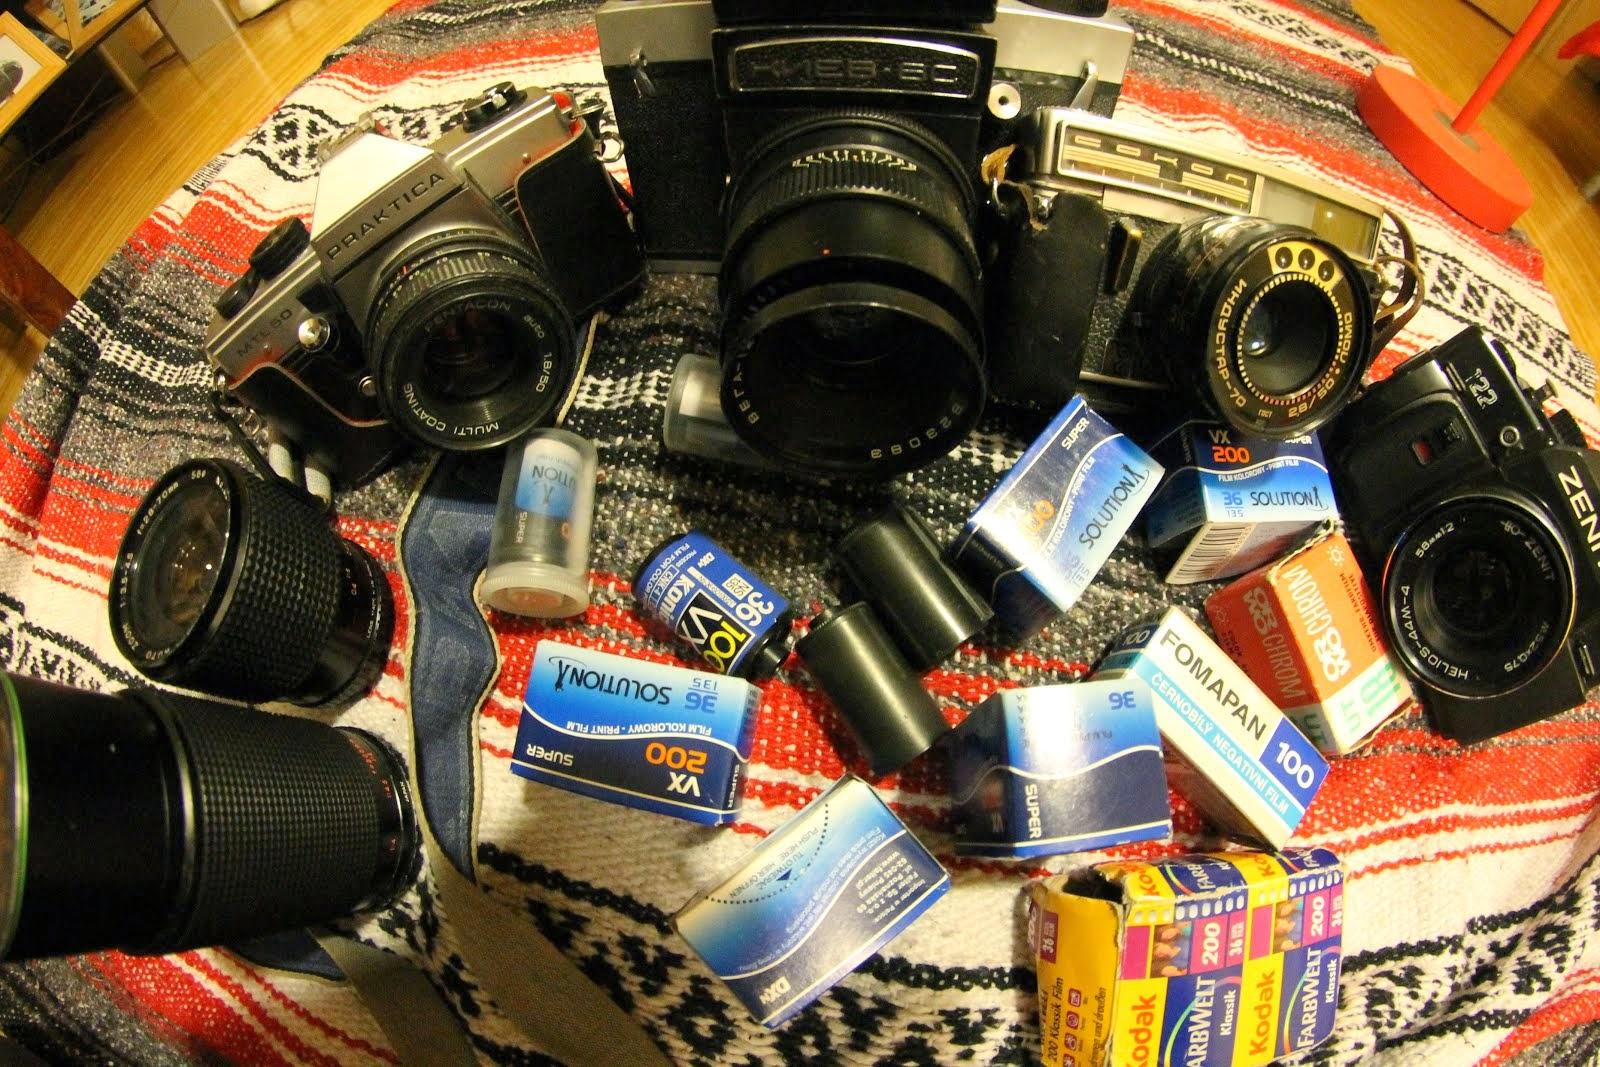 Part of my analog photo cameras